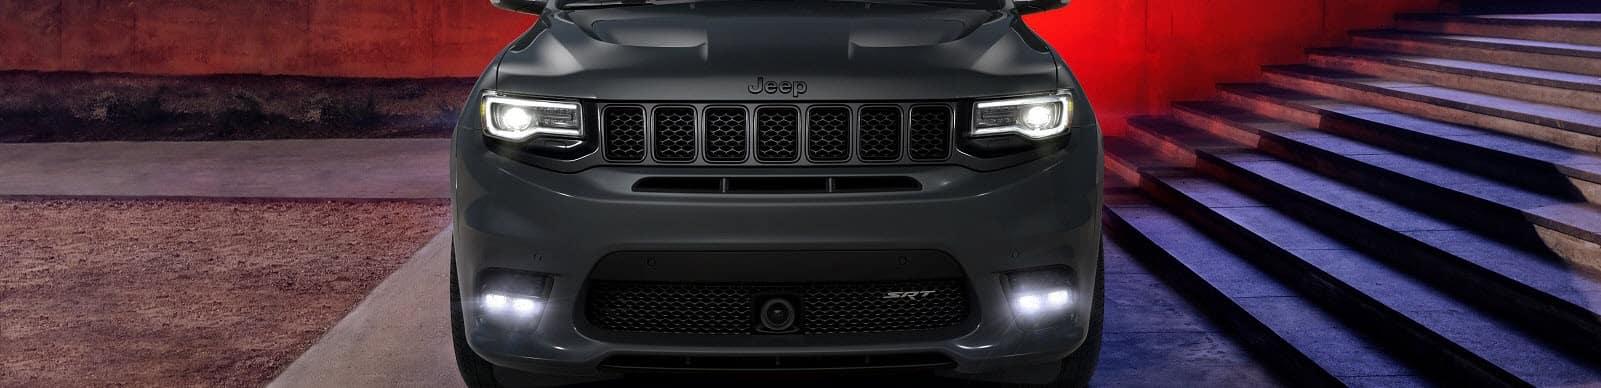 Jeep Grand Cherokee Arlington TN